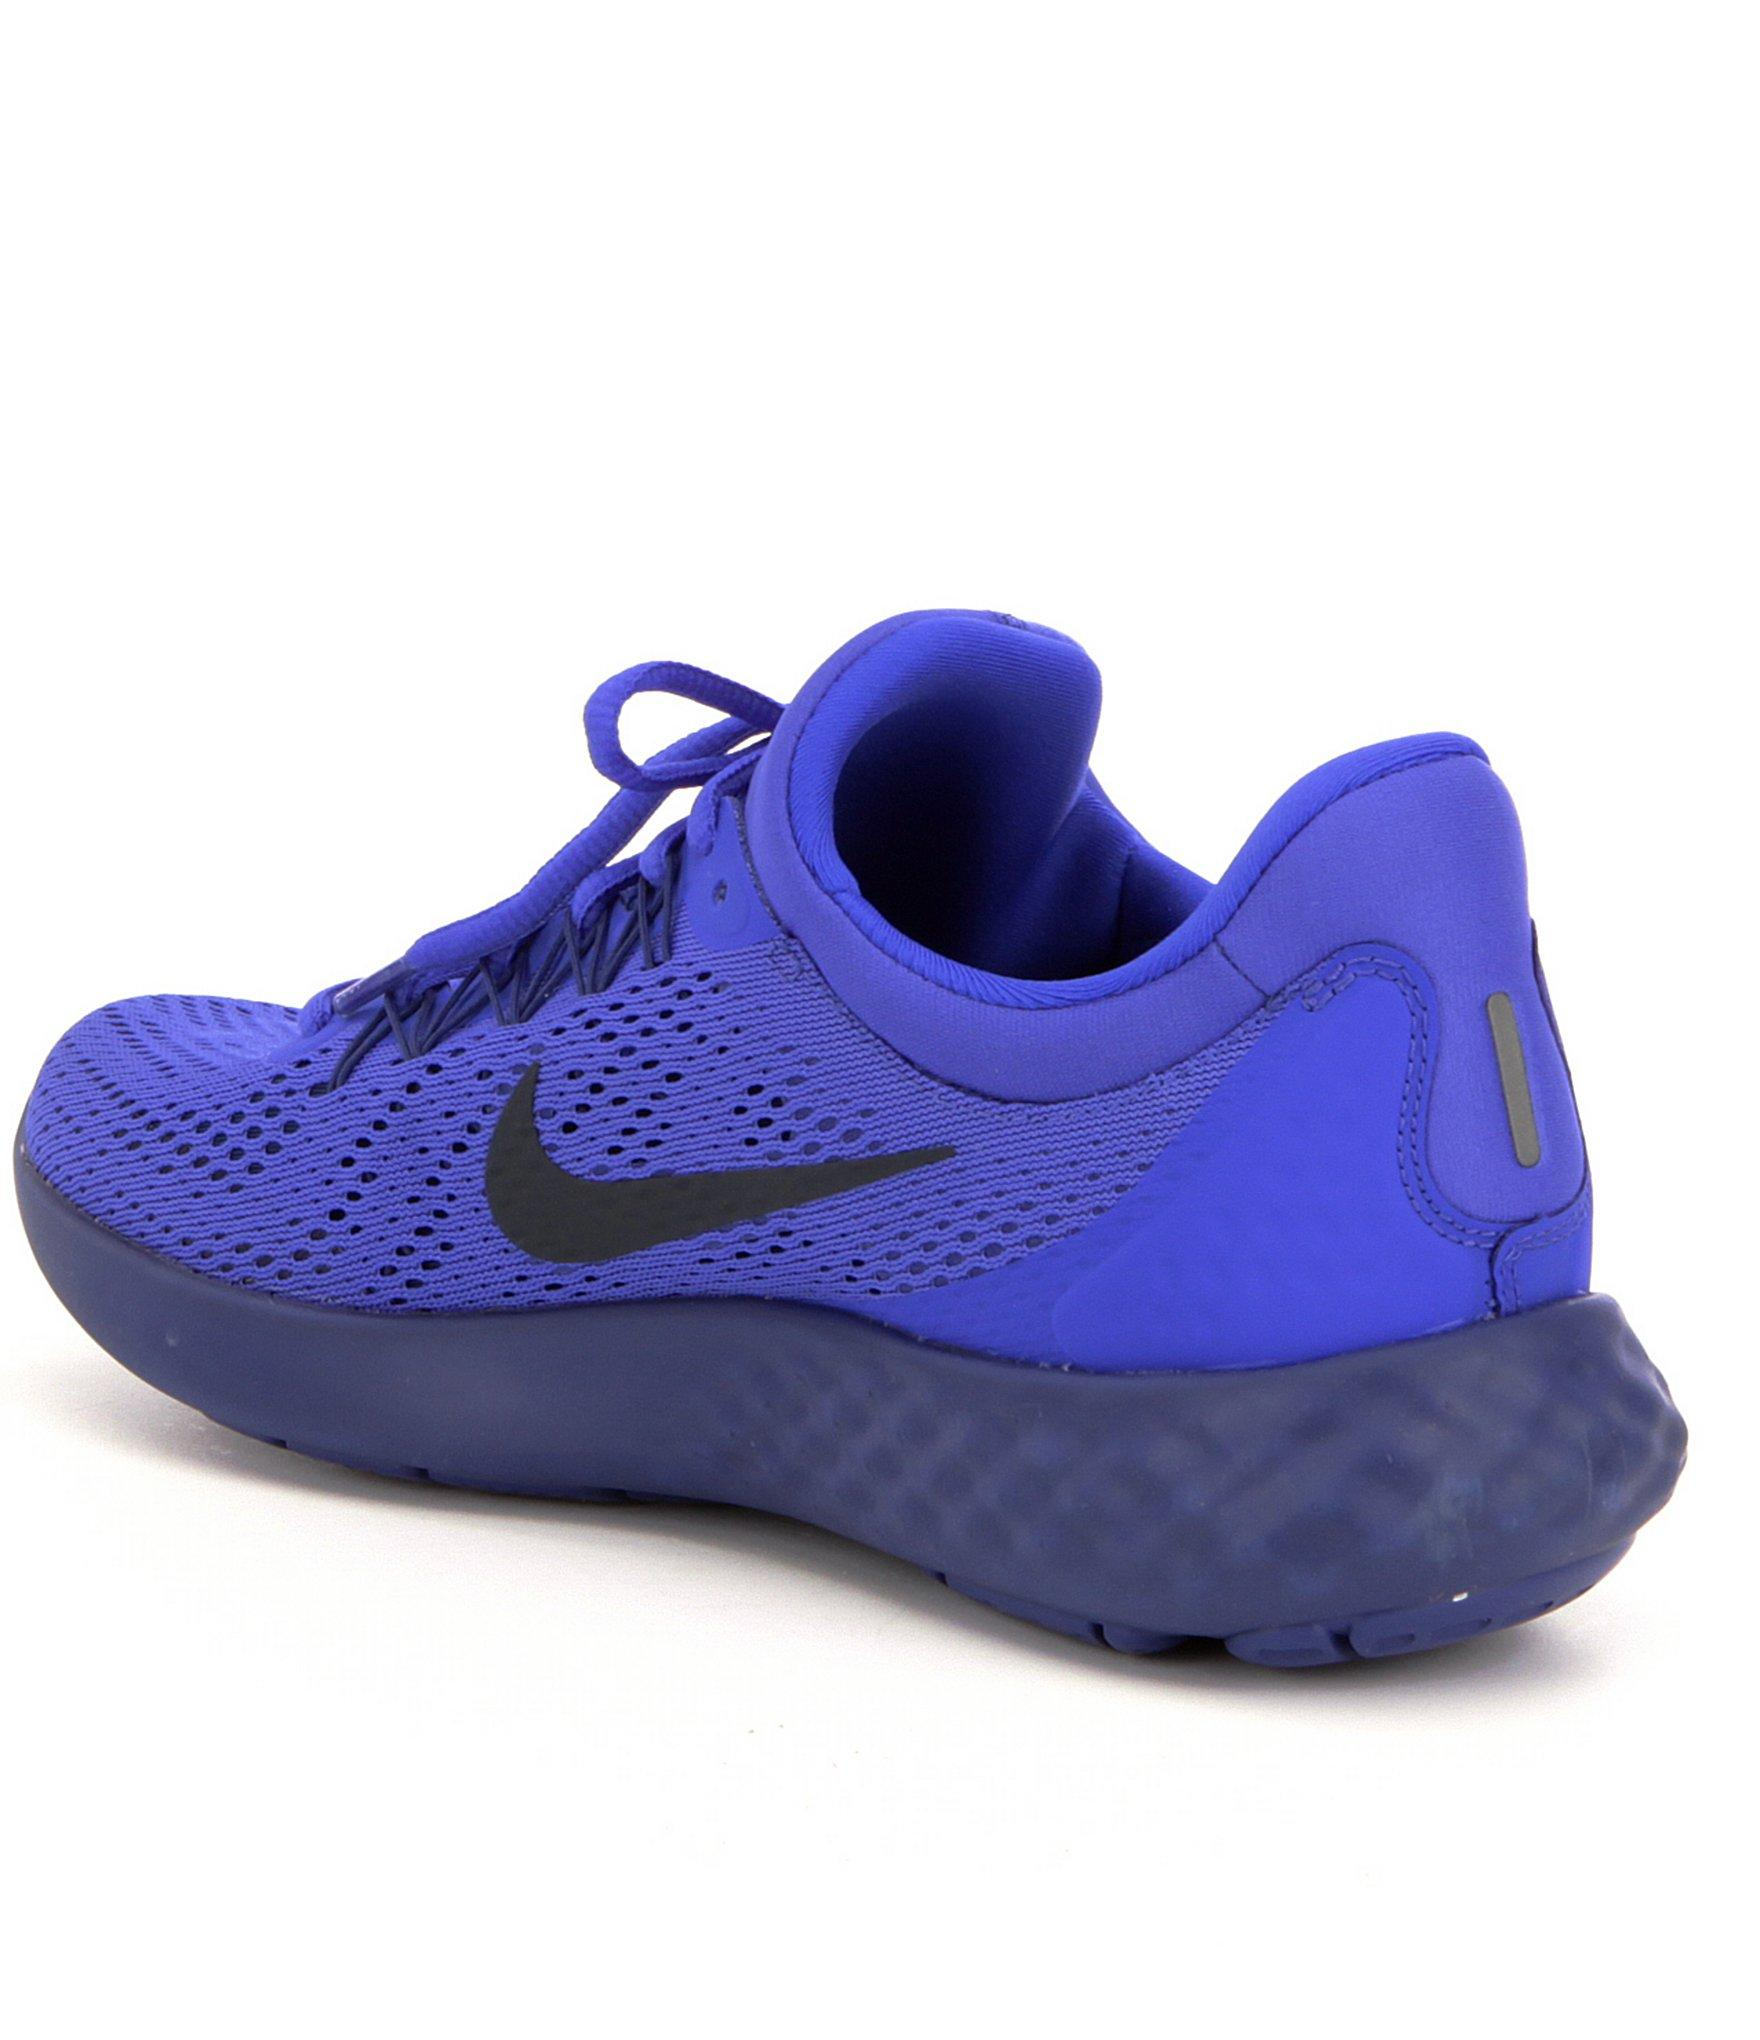 1cbd643aa5d9 Lyst - Nike Men ́s Lunar Skyelux Engineered Mesh Lace Up Running ...